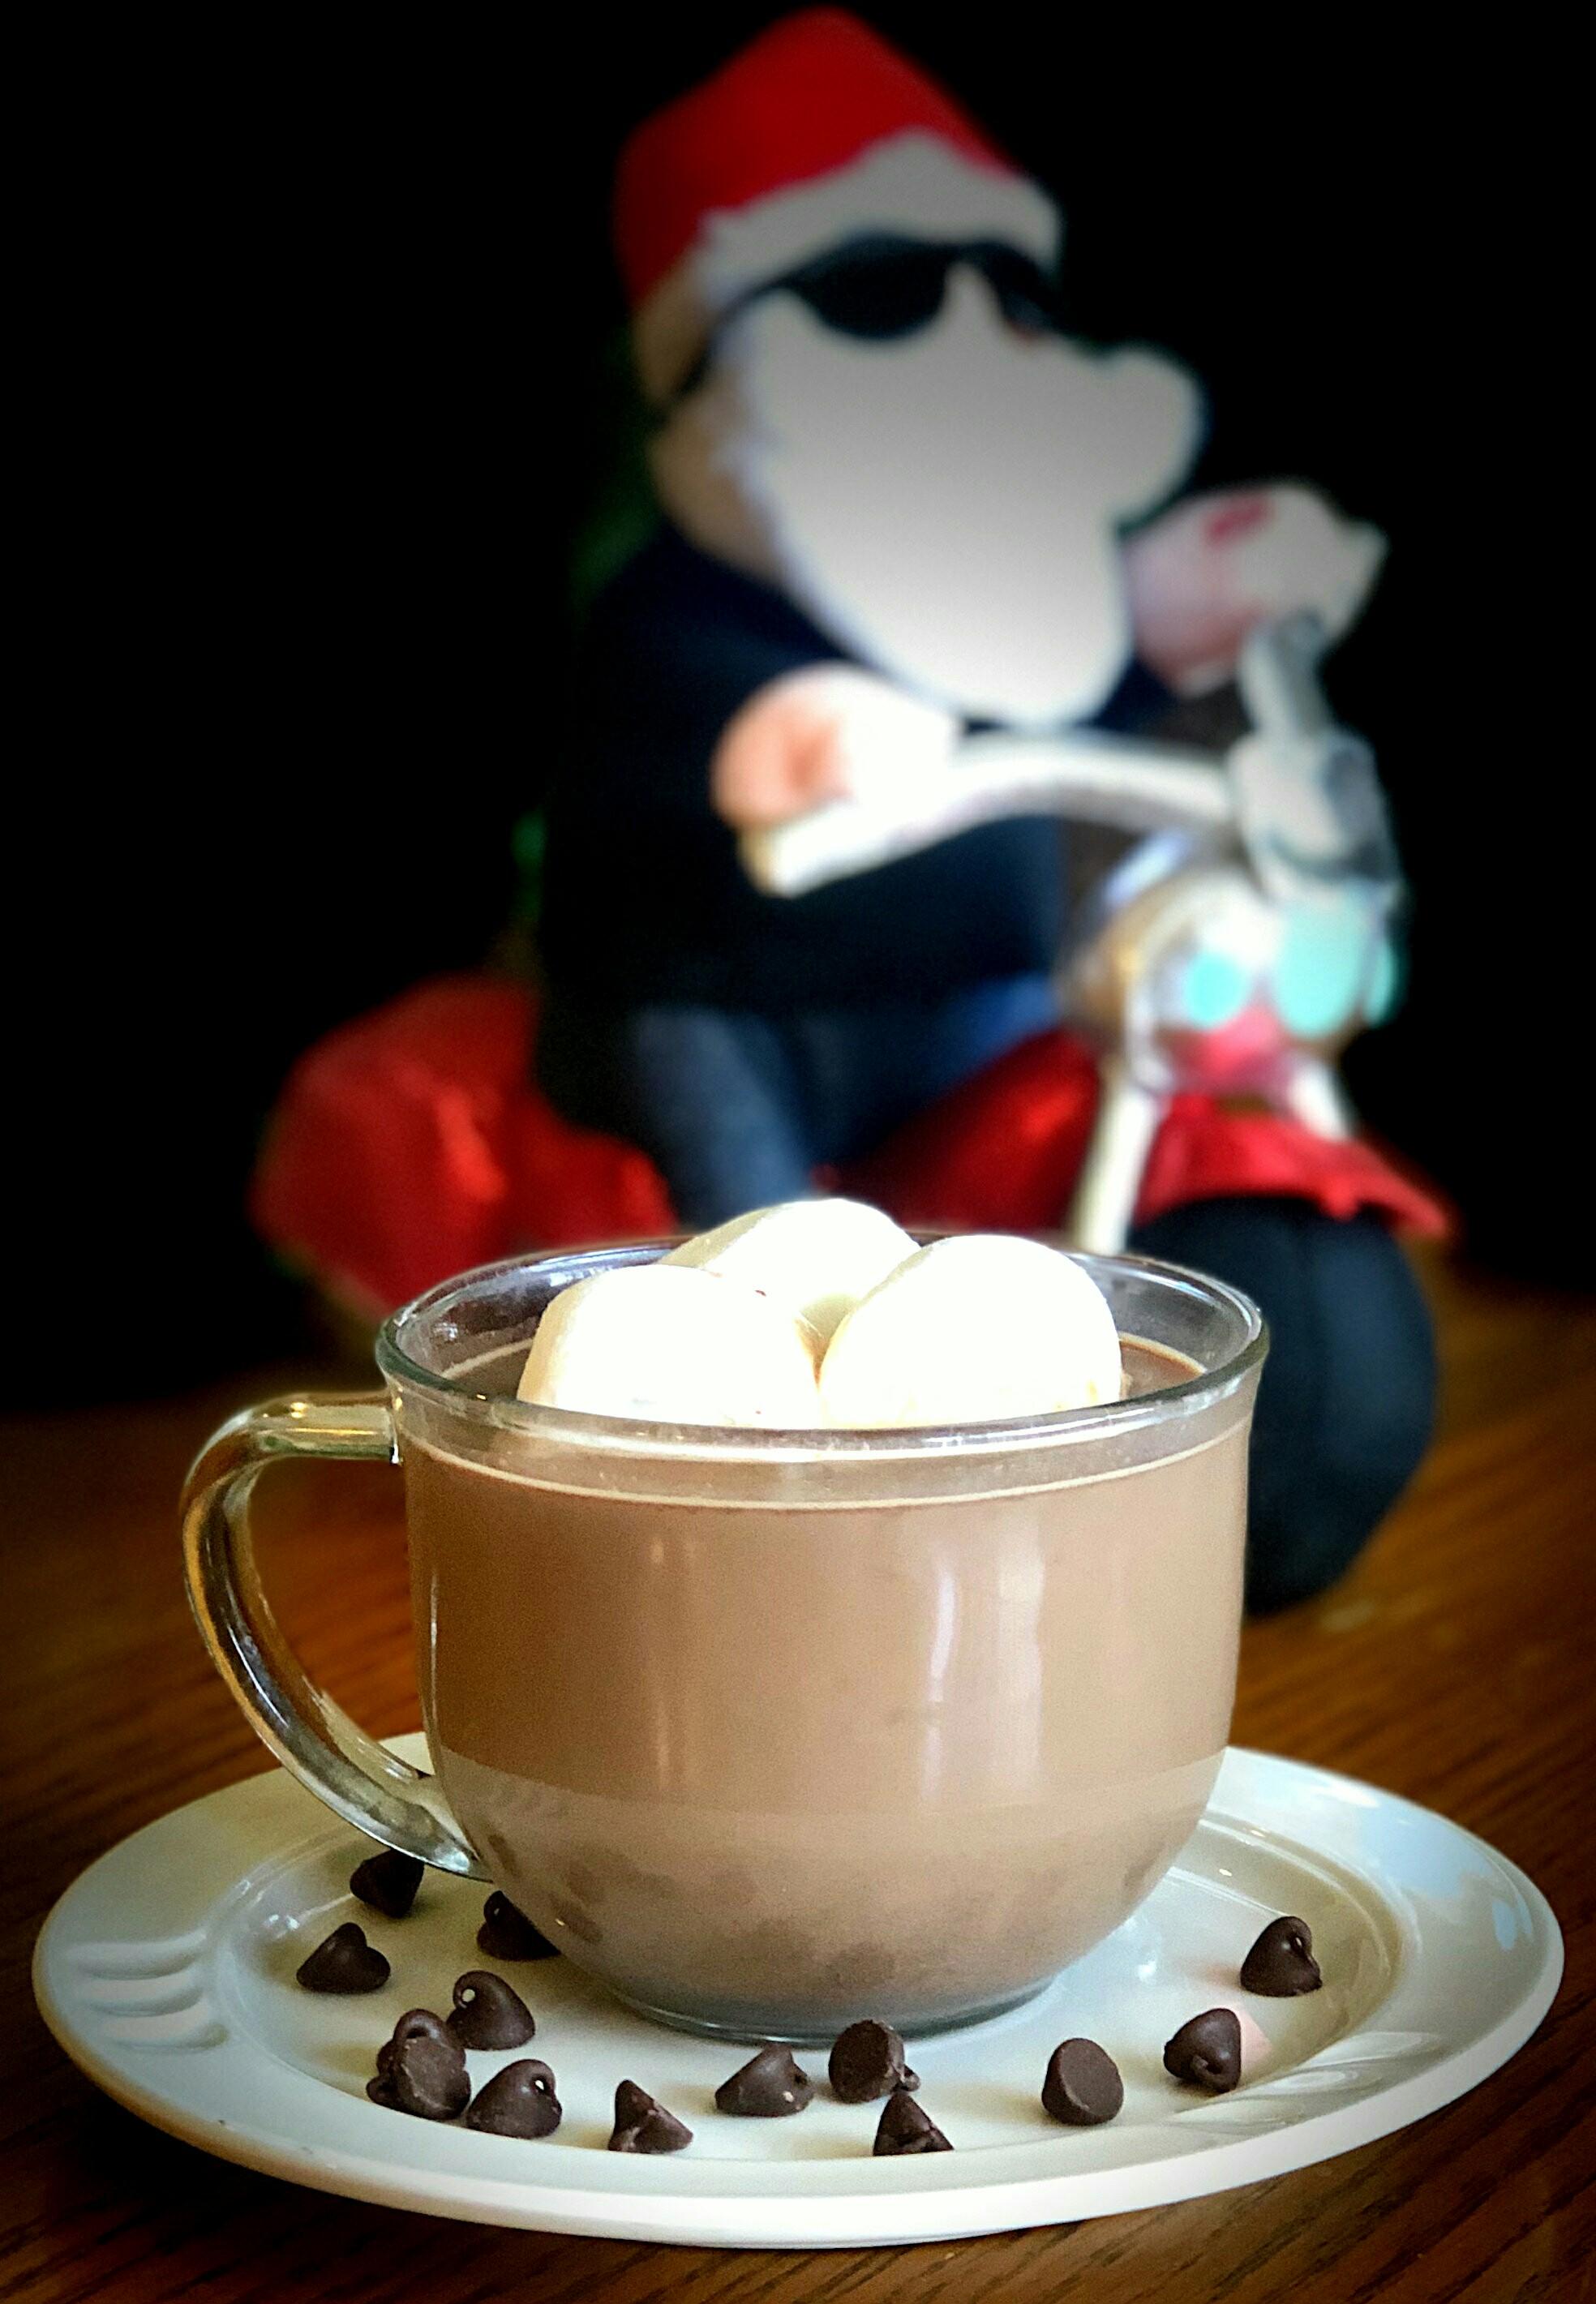 'The Polar Express' Creamy Hot Chocolate